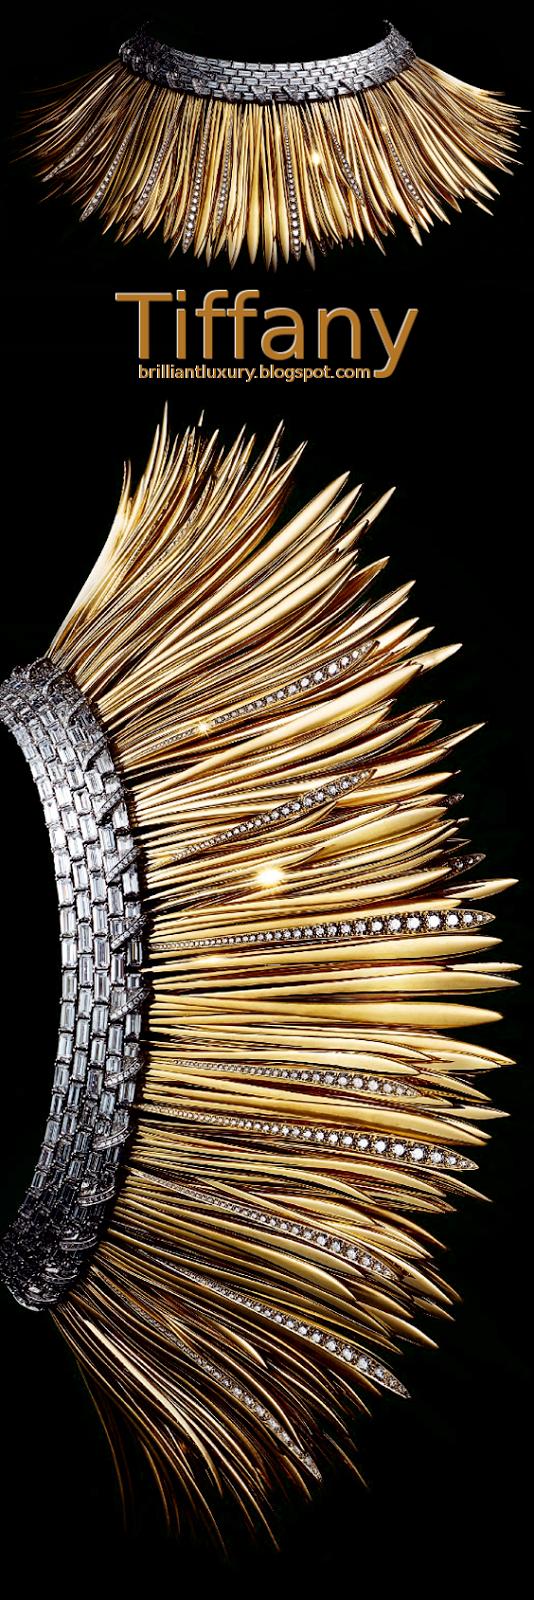 Brilliant Luxury ♦ Tiffany Platinium gold & diamond necklace